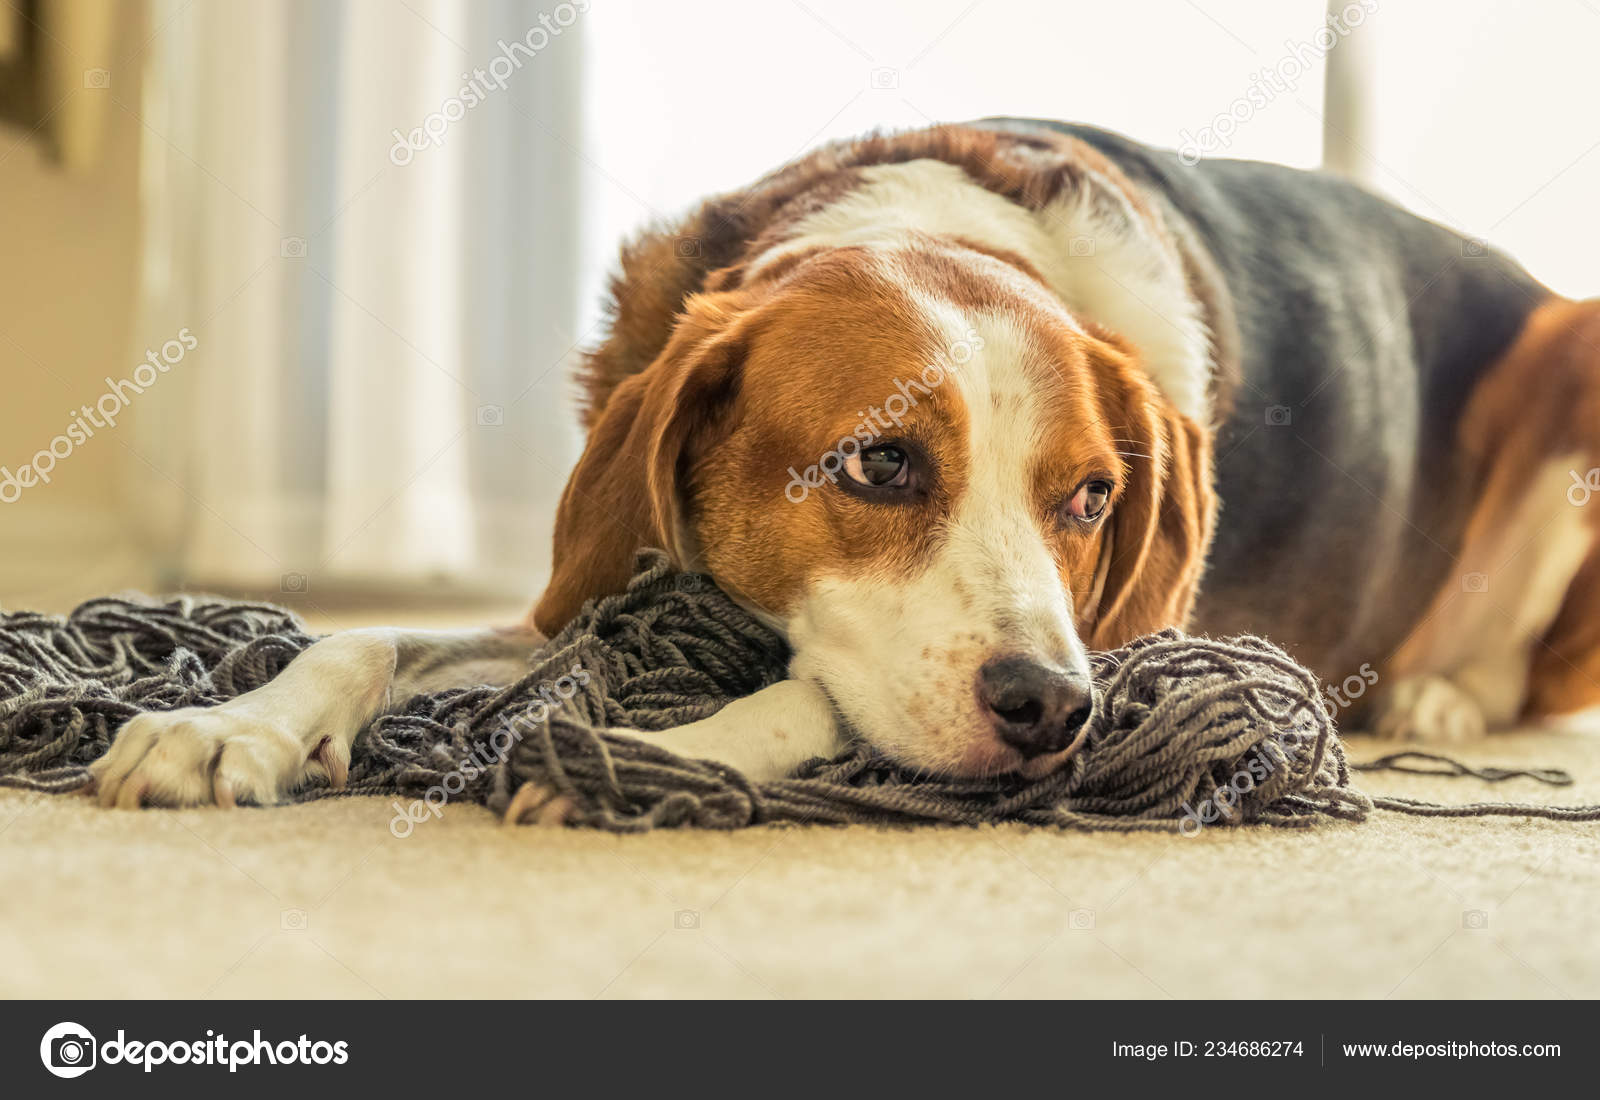 Adorable Beagle Dog Mix Laying Big Tangled Mess Grey Yarn Stock Photo C Ryanhoel 234686274